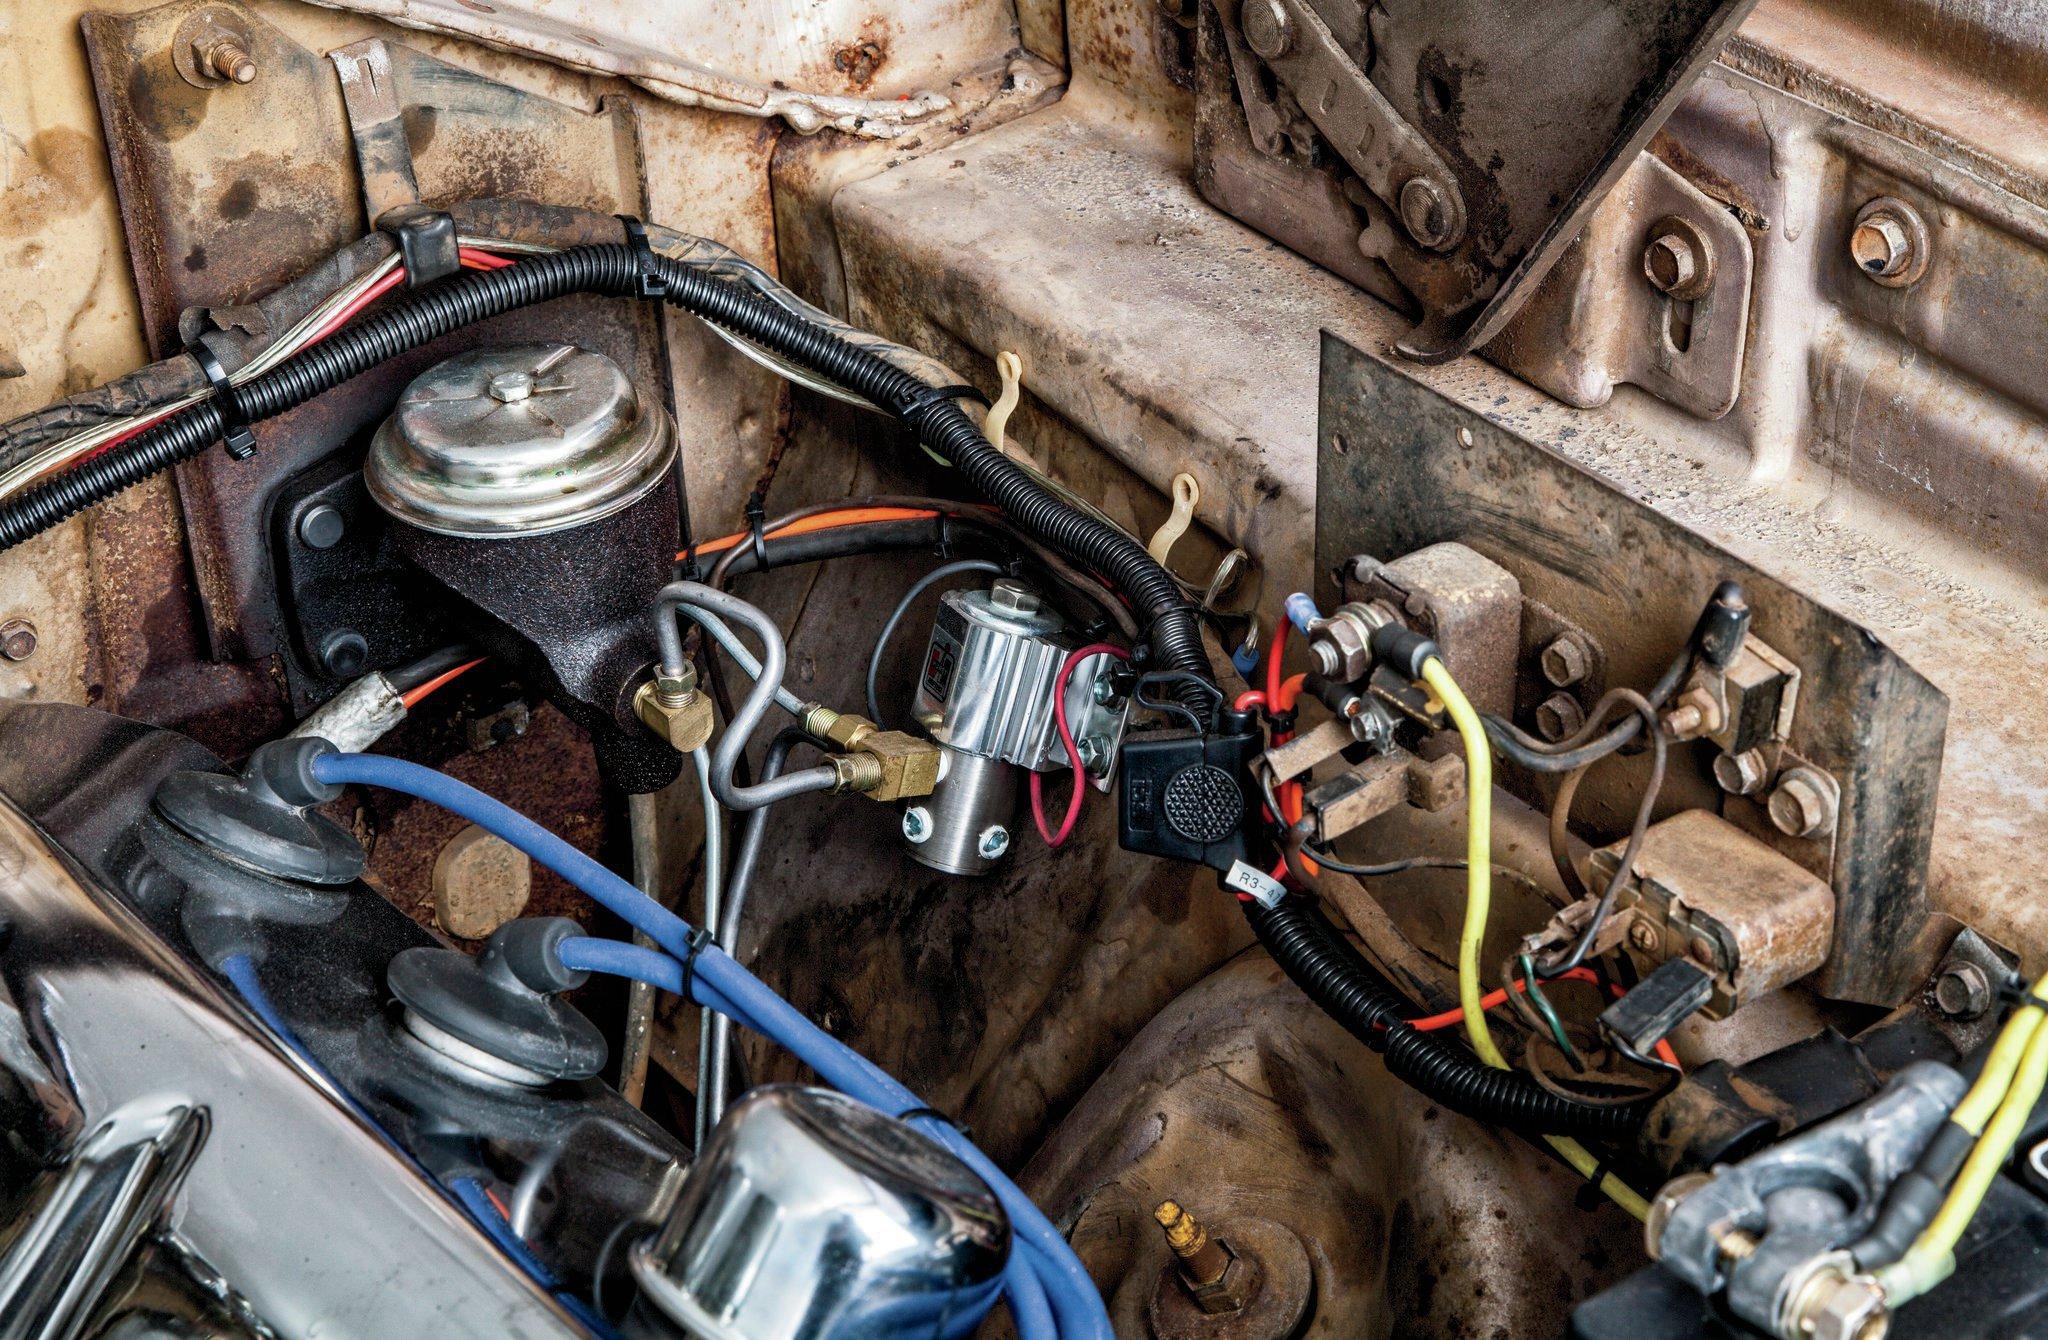 1966 dodge coronet unrestored 426ci hemi engine wiring on firewall rh hotrod com [ 2048 x 1340 Pixel ]